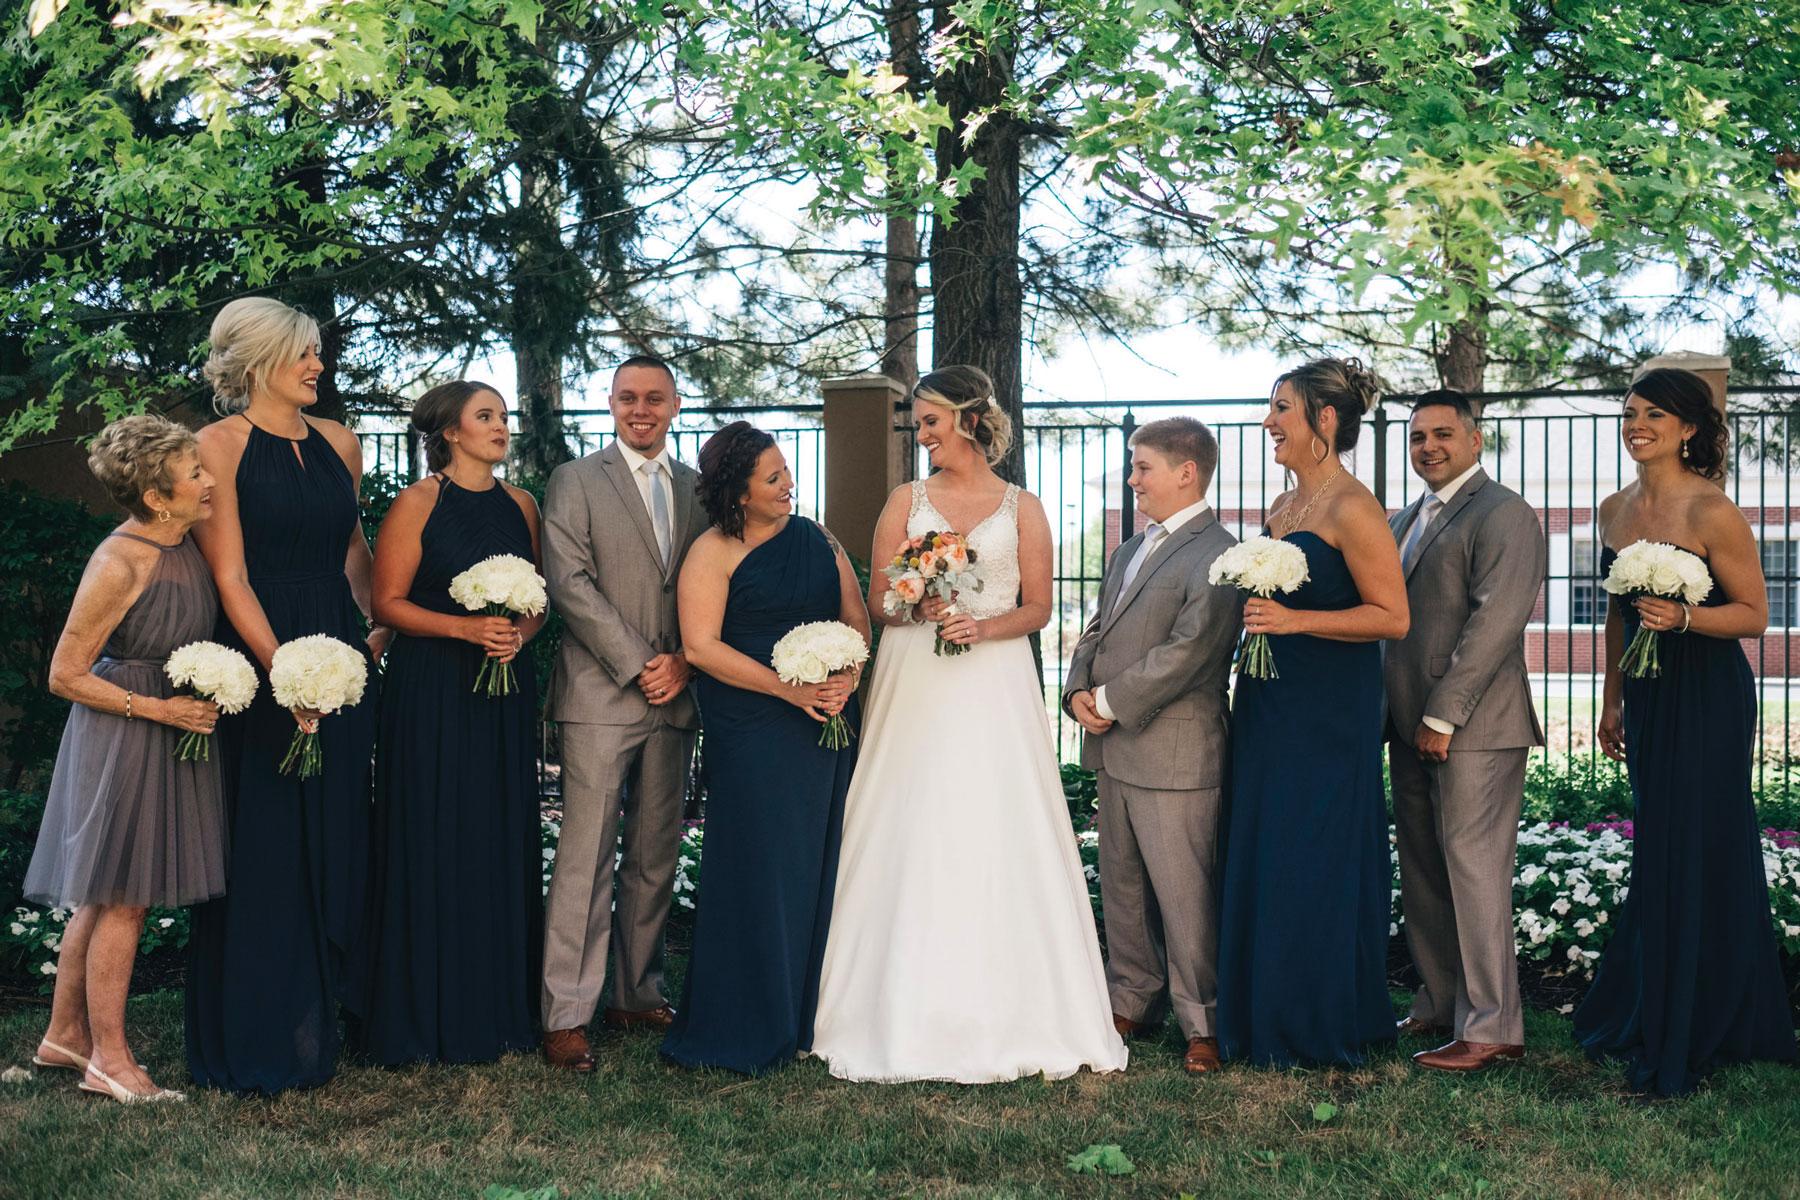 LeeAnn+Chris_Wedding-226.jpg